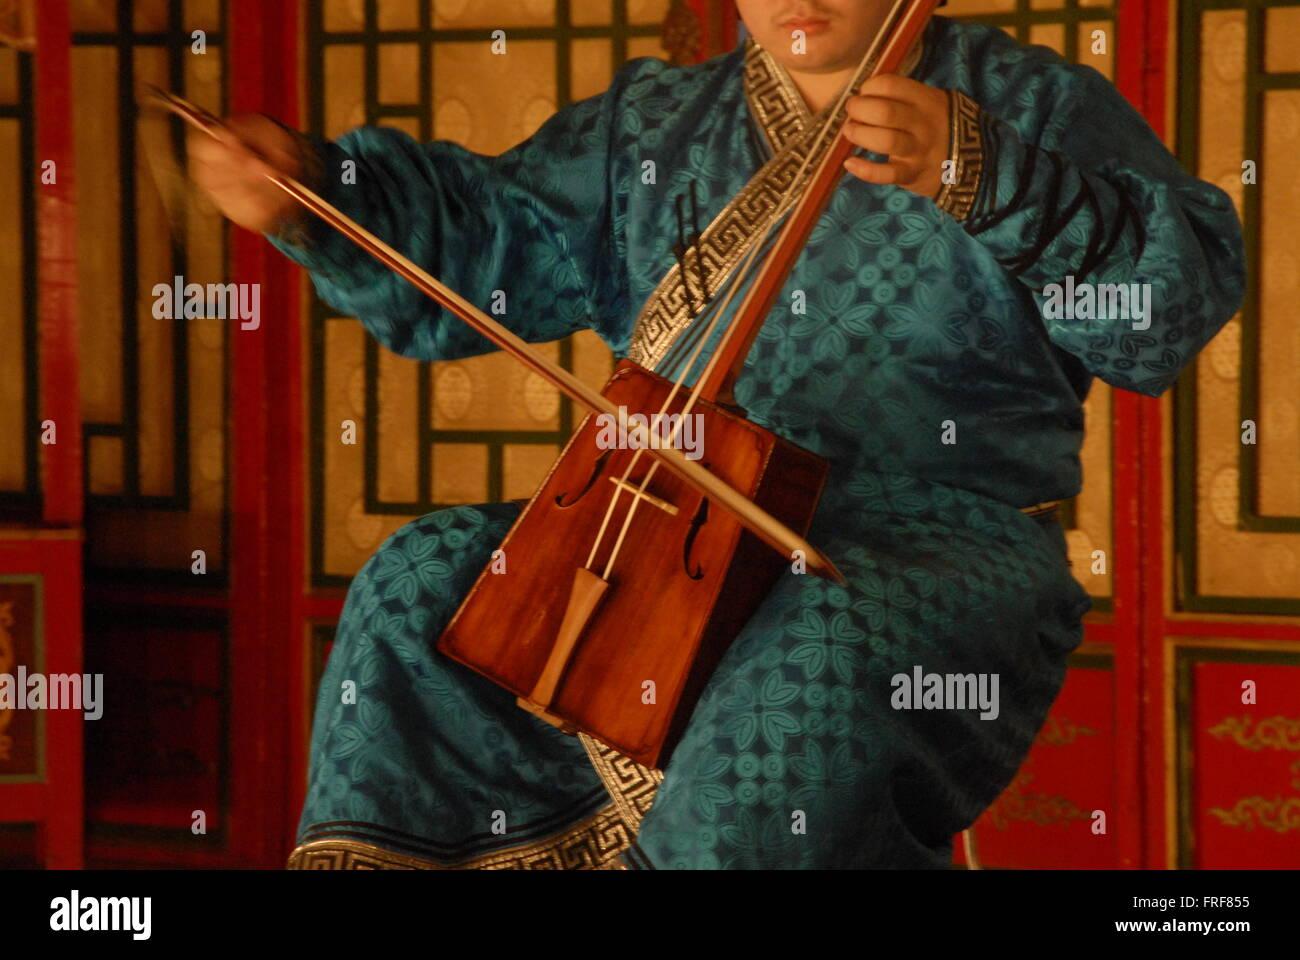 Mongolia -  09/08/2010  -  Mongolia / Ulan Bator / Ulan Bator  -  Horse fiddle   -  Sandrine Huet / Le Pictorium - Stock Image